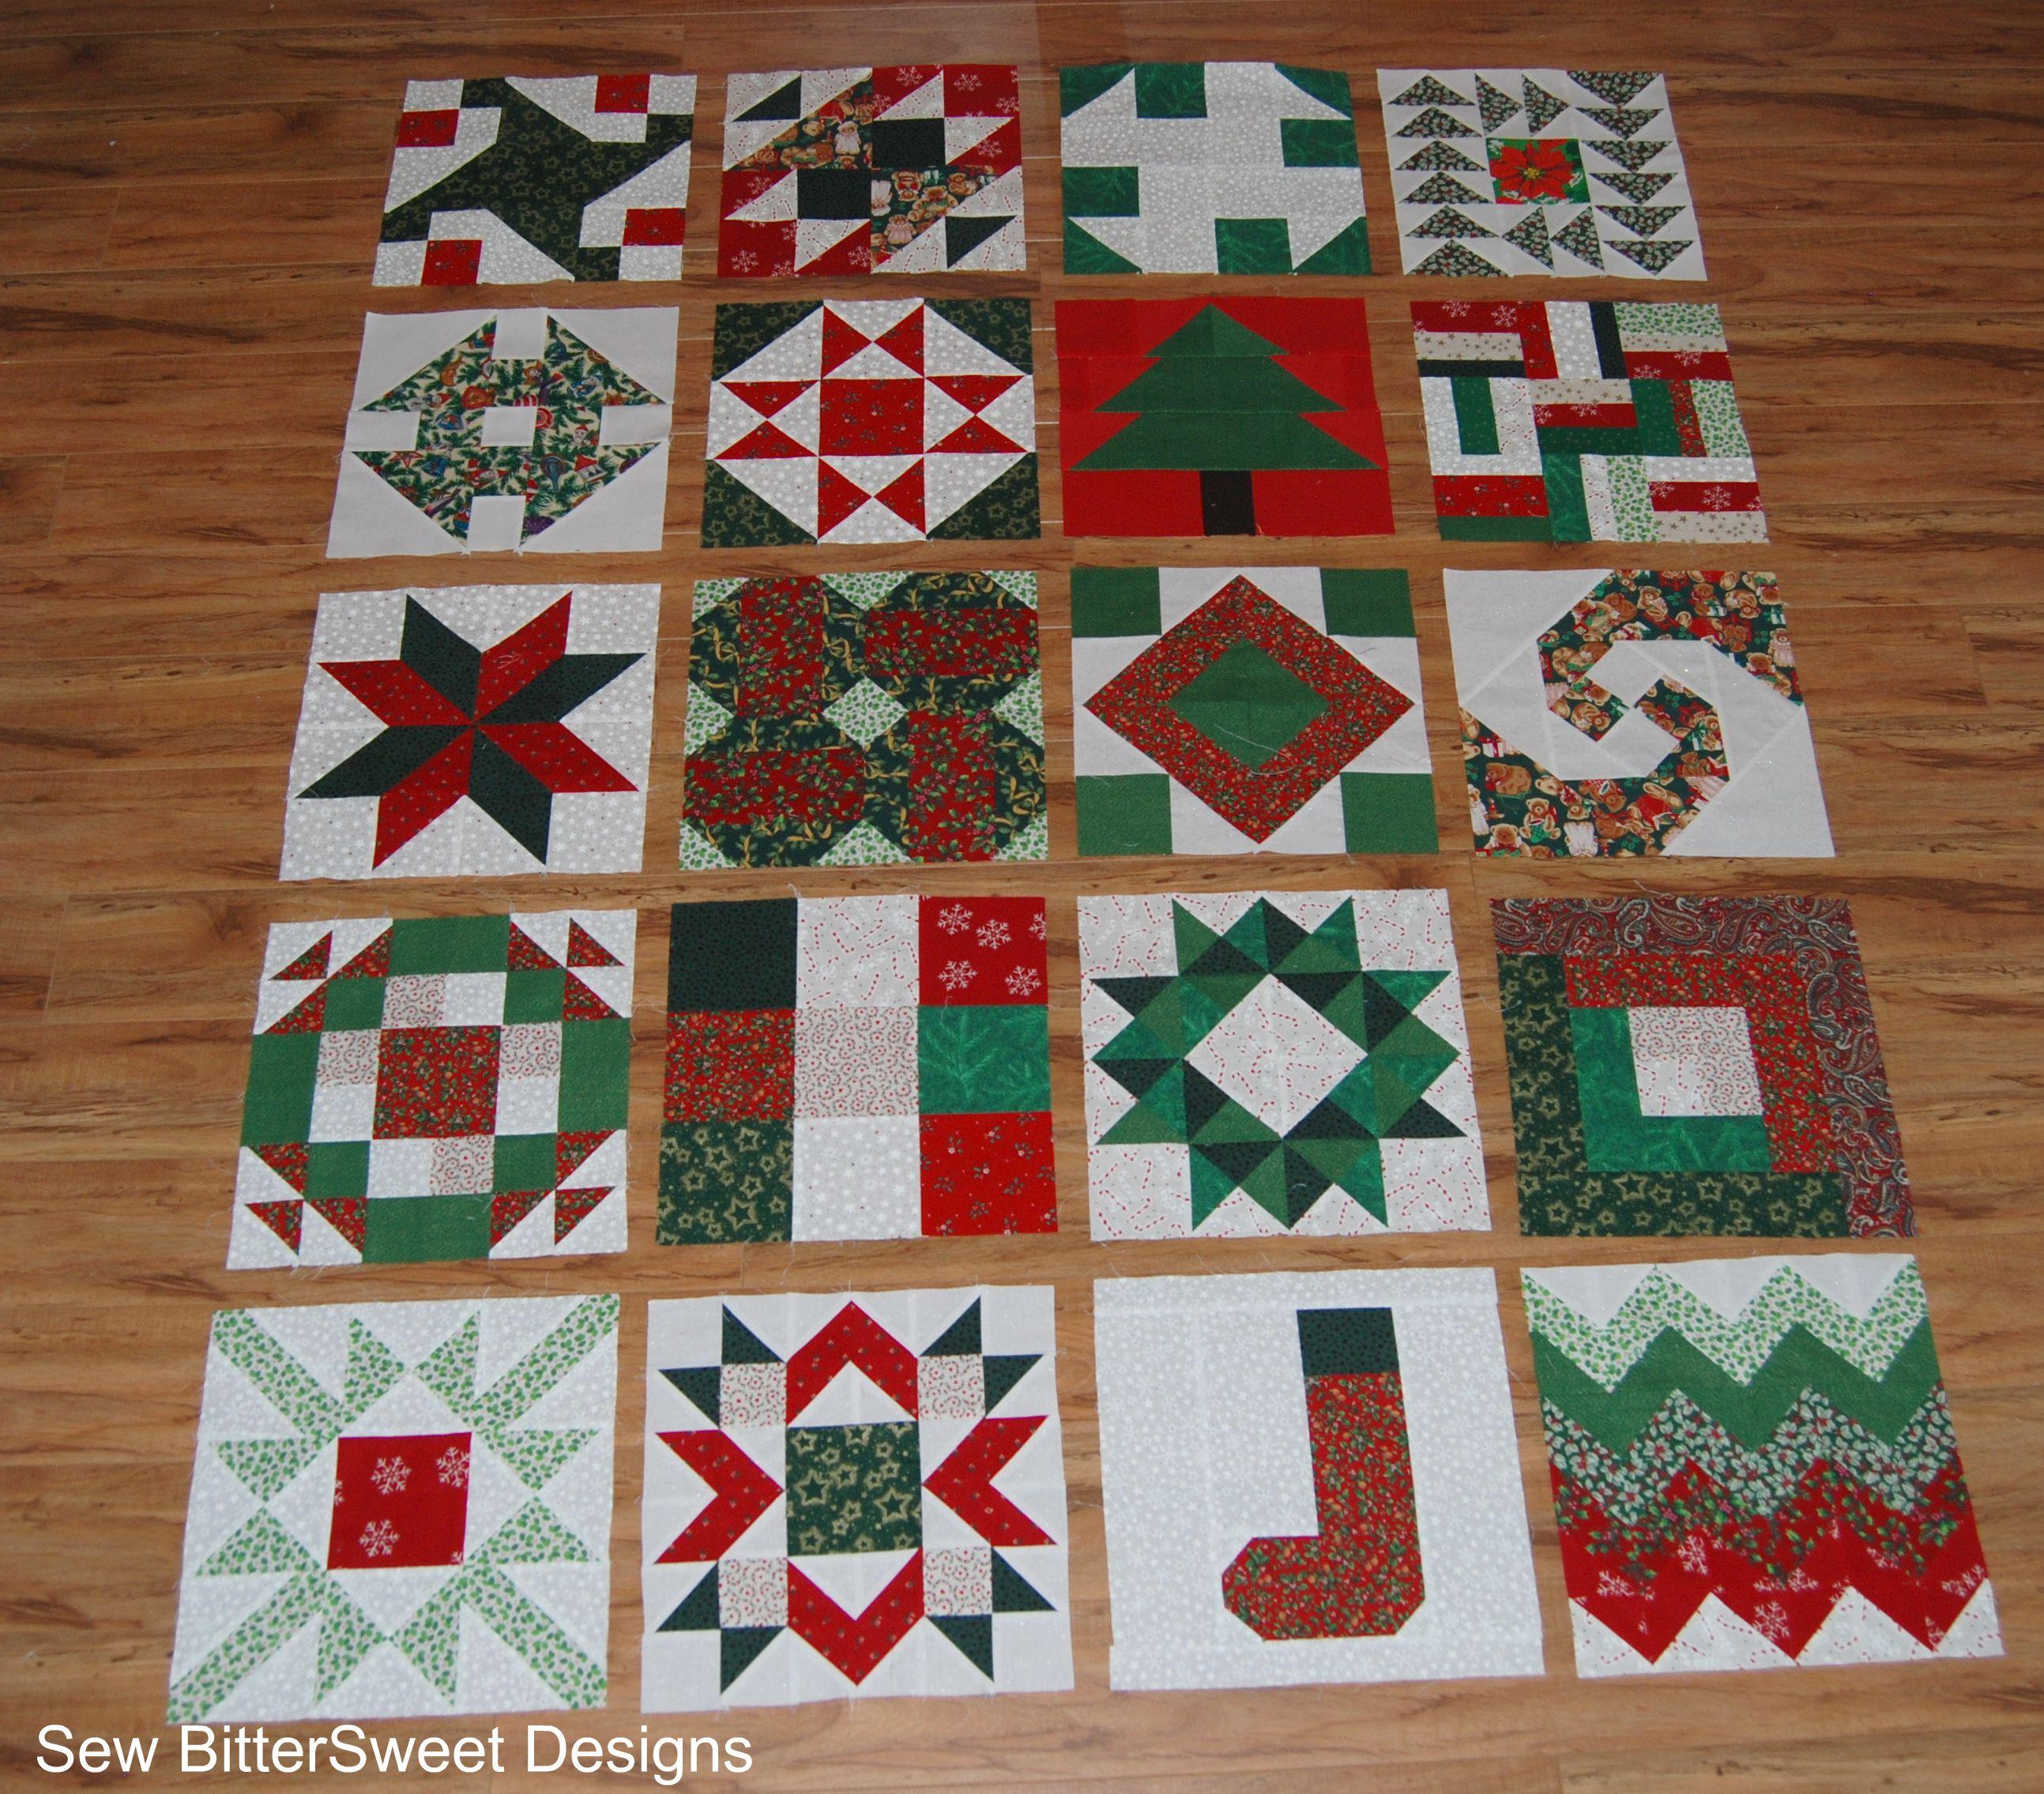 Vintage Christmas Sampler Tutorials Sew Bittersweet Designs Christmas Quilt Blocks Christmas Patchwork Christmas Quilt Patterns